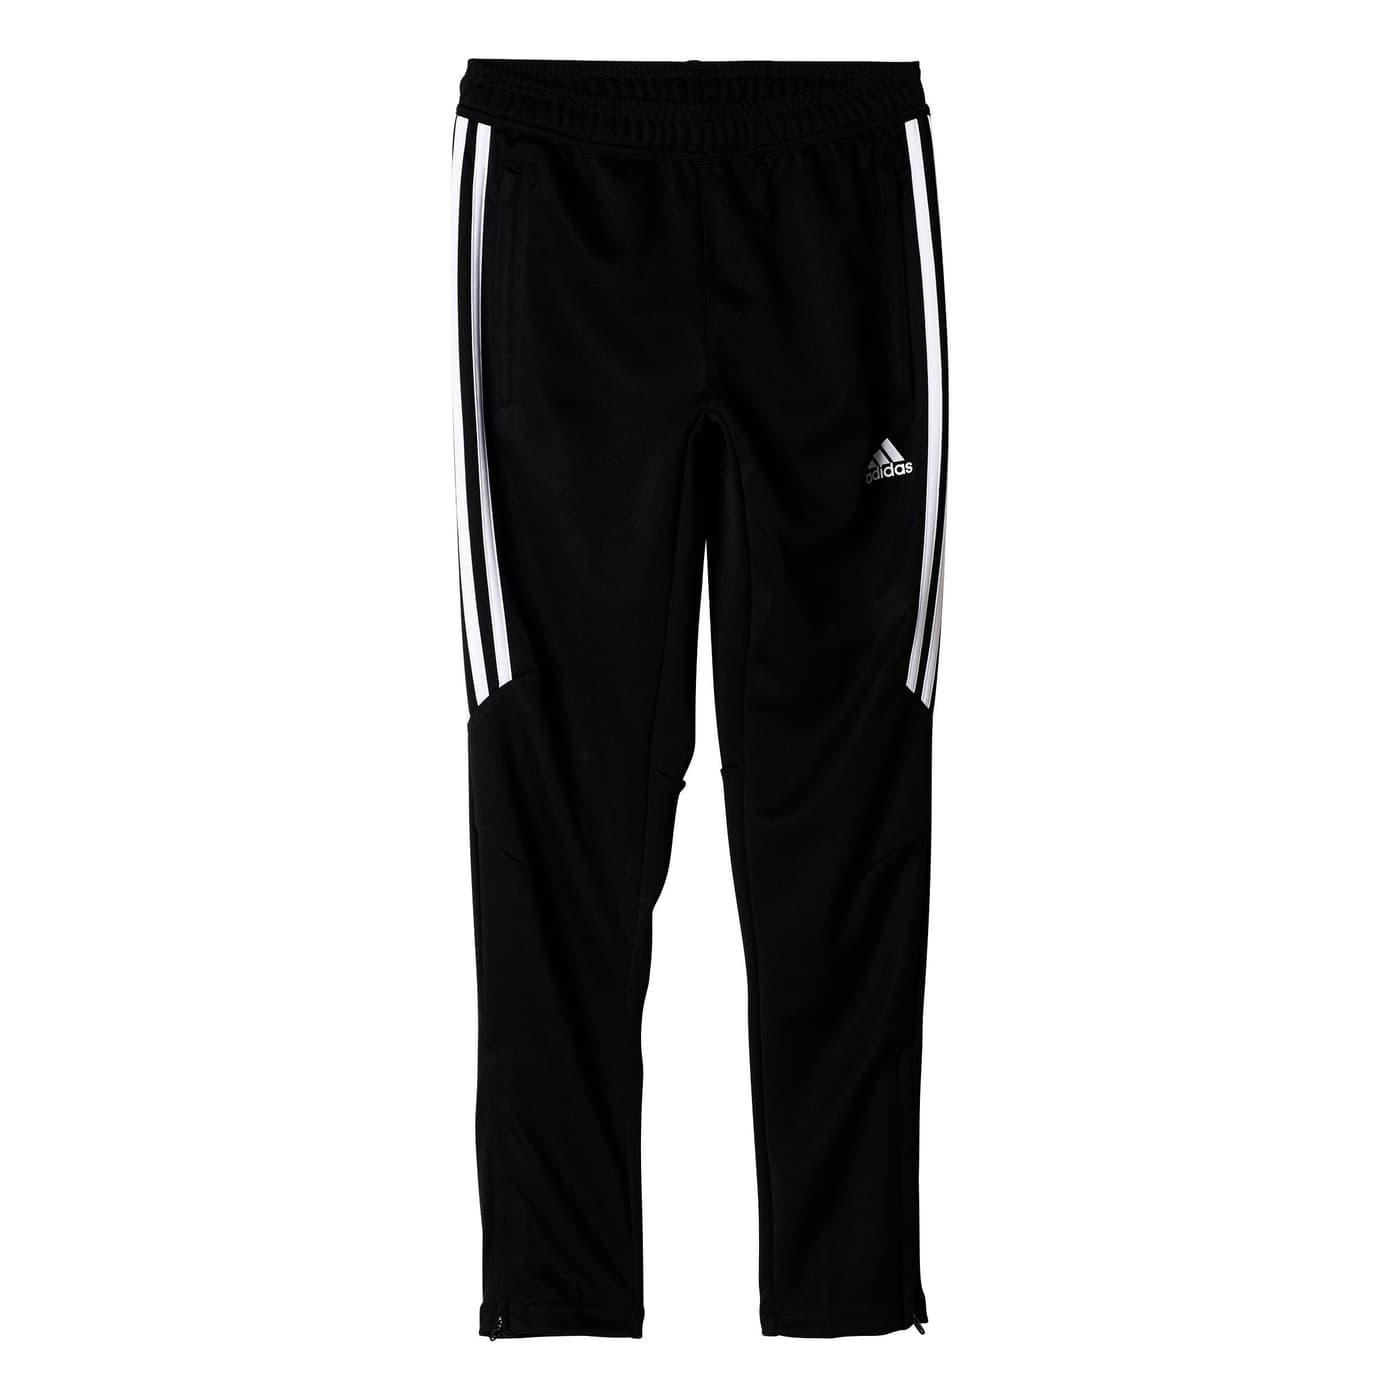 3 Bambini Migros Calcio Pantaloni Adidas Tiro Per Stripes Da Pant qEapxnRgwU